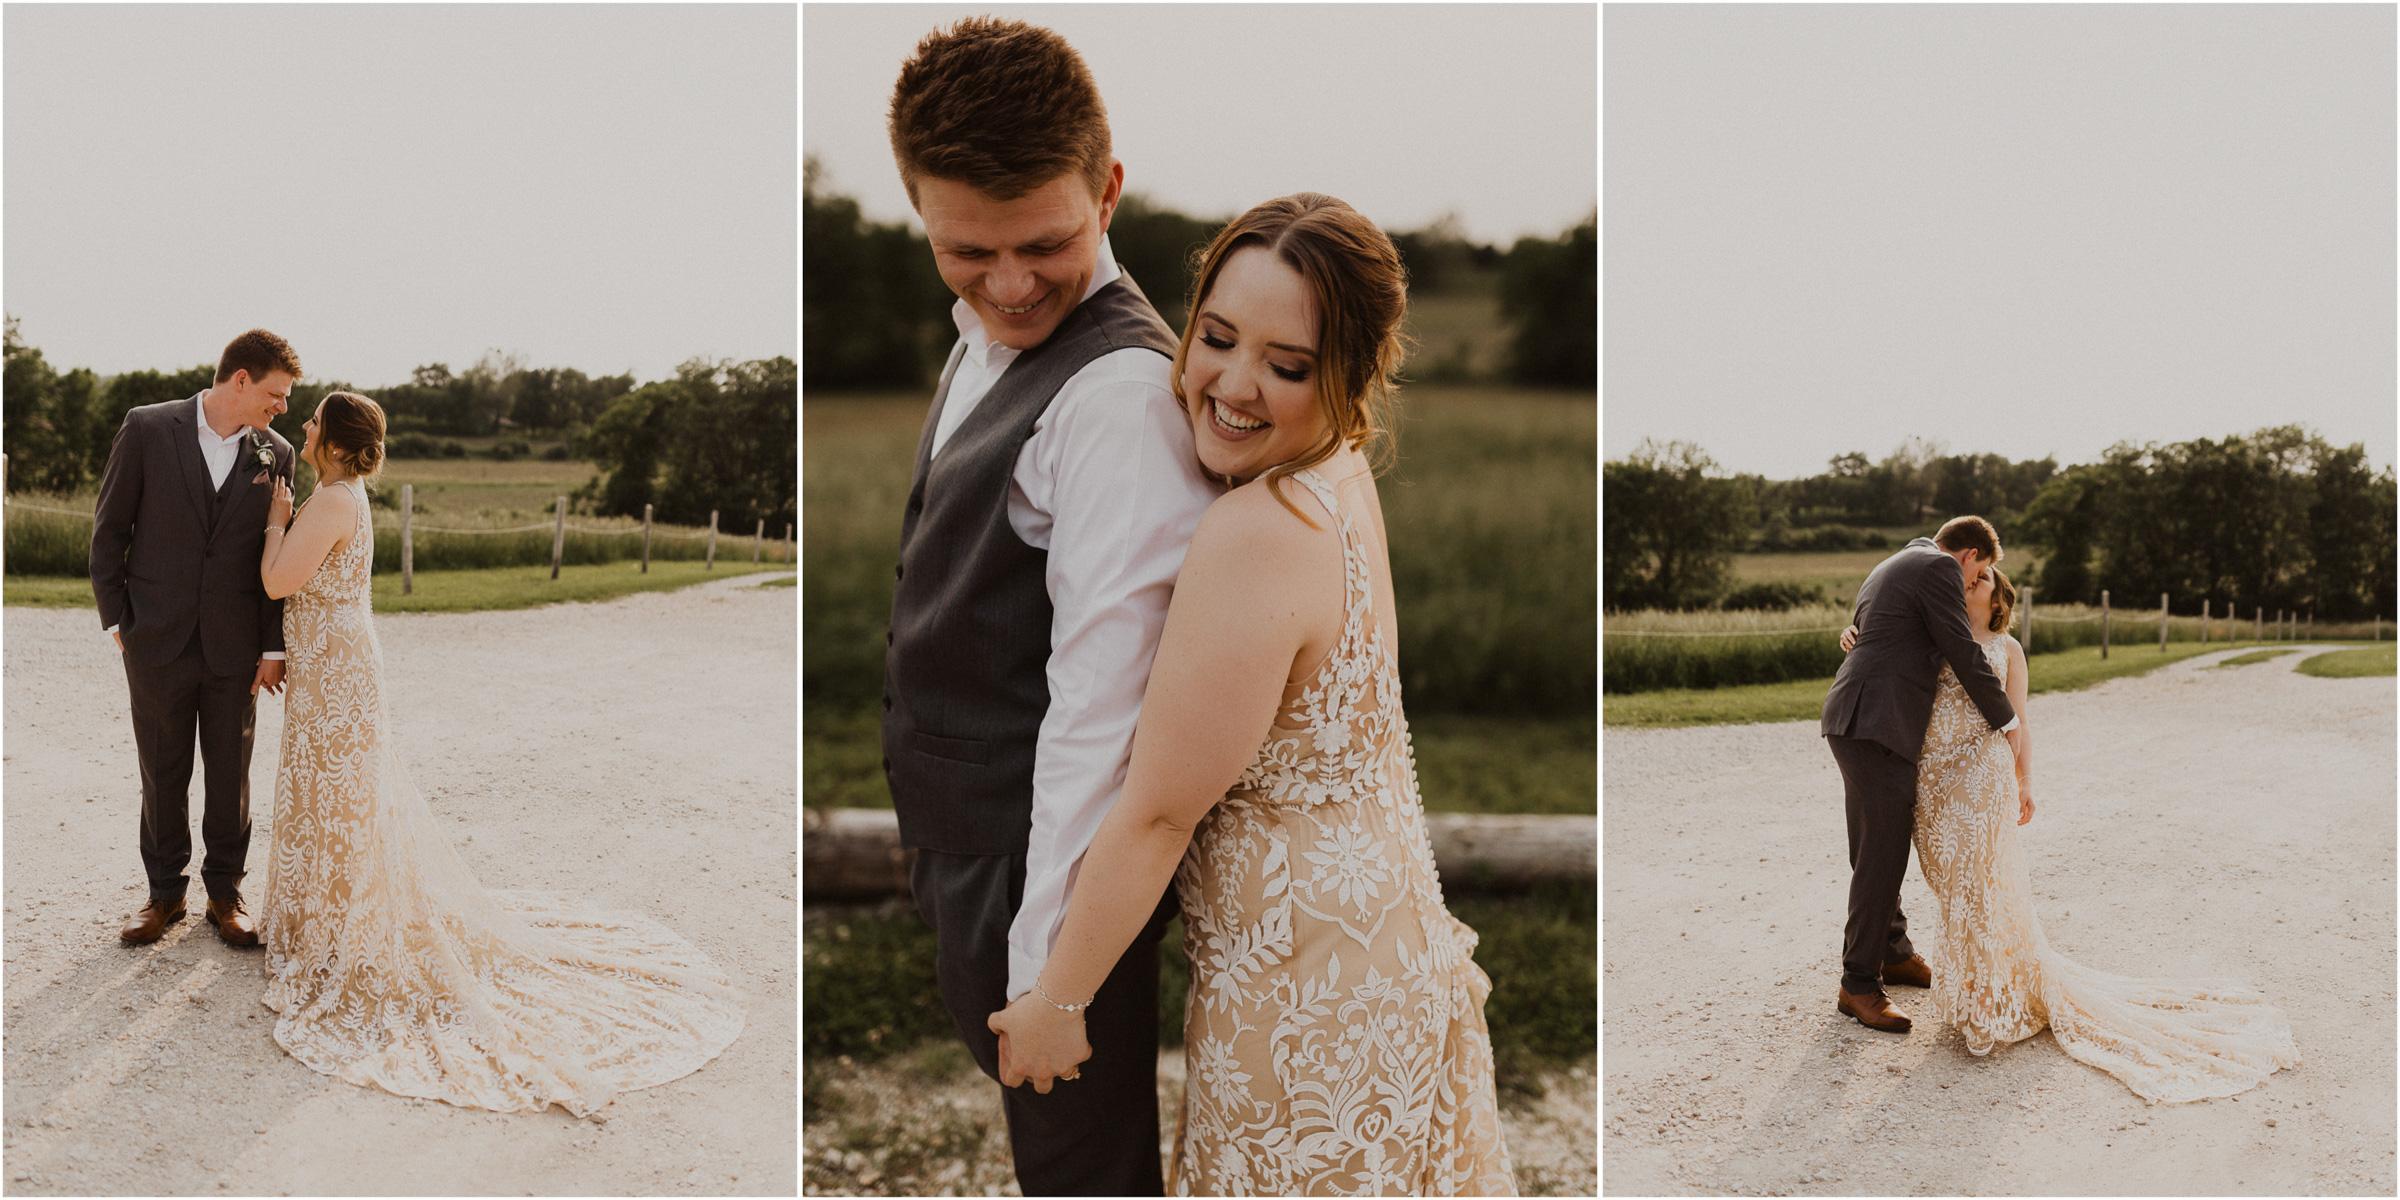 alyssa barletter photography weston red barn farm timberbarn summer outdoor wedding-50.jpg